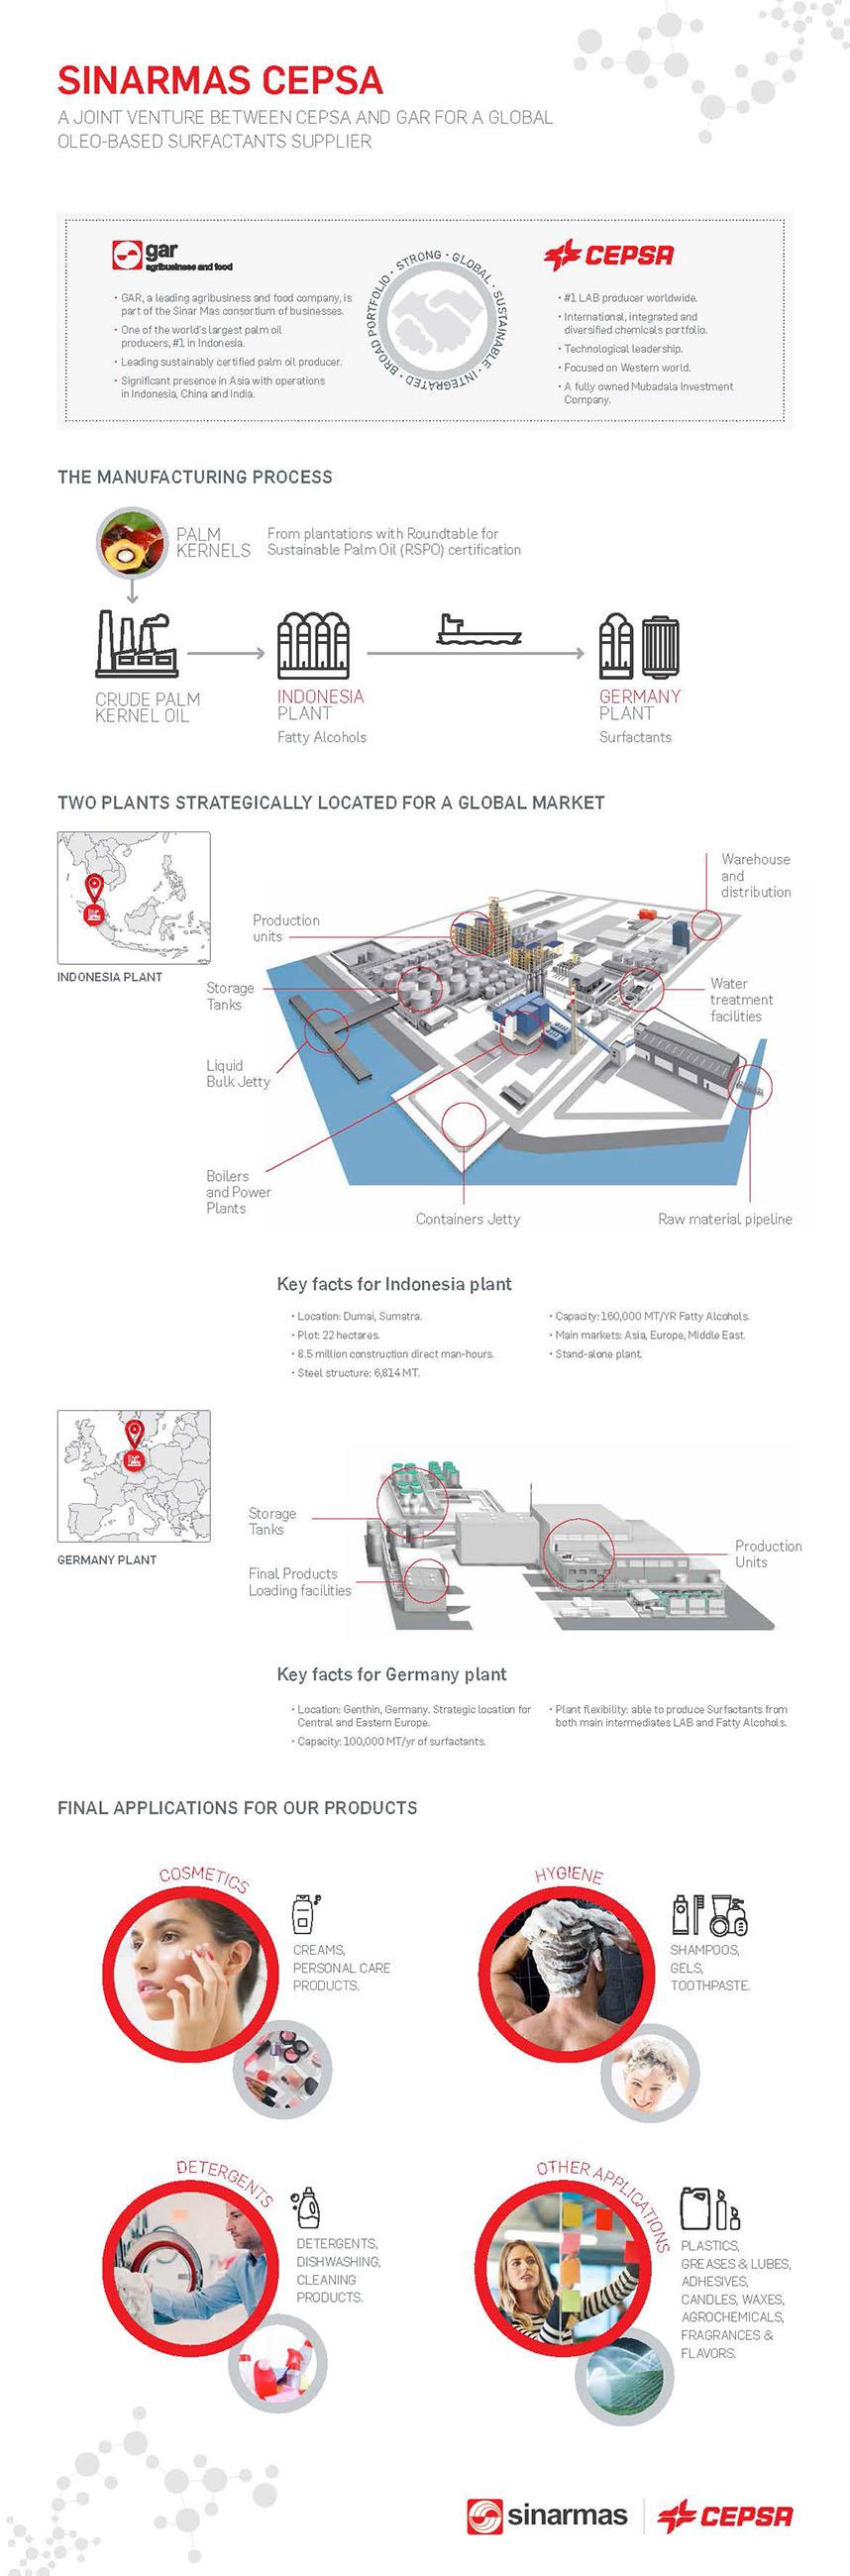 Sinarmas Cepsa starts up production at EUR 300 million plant in Indonesia